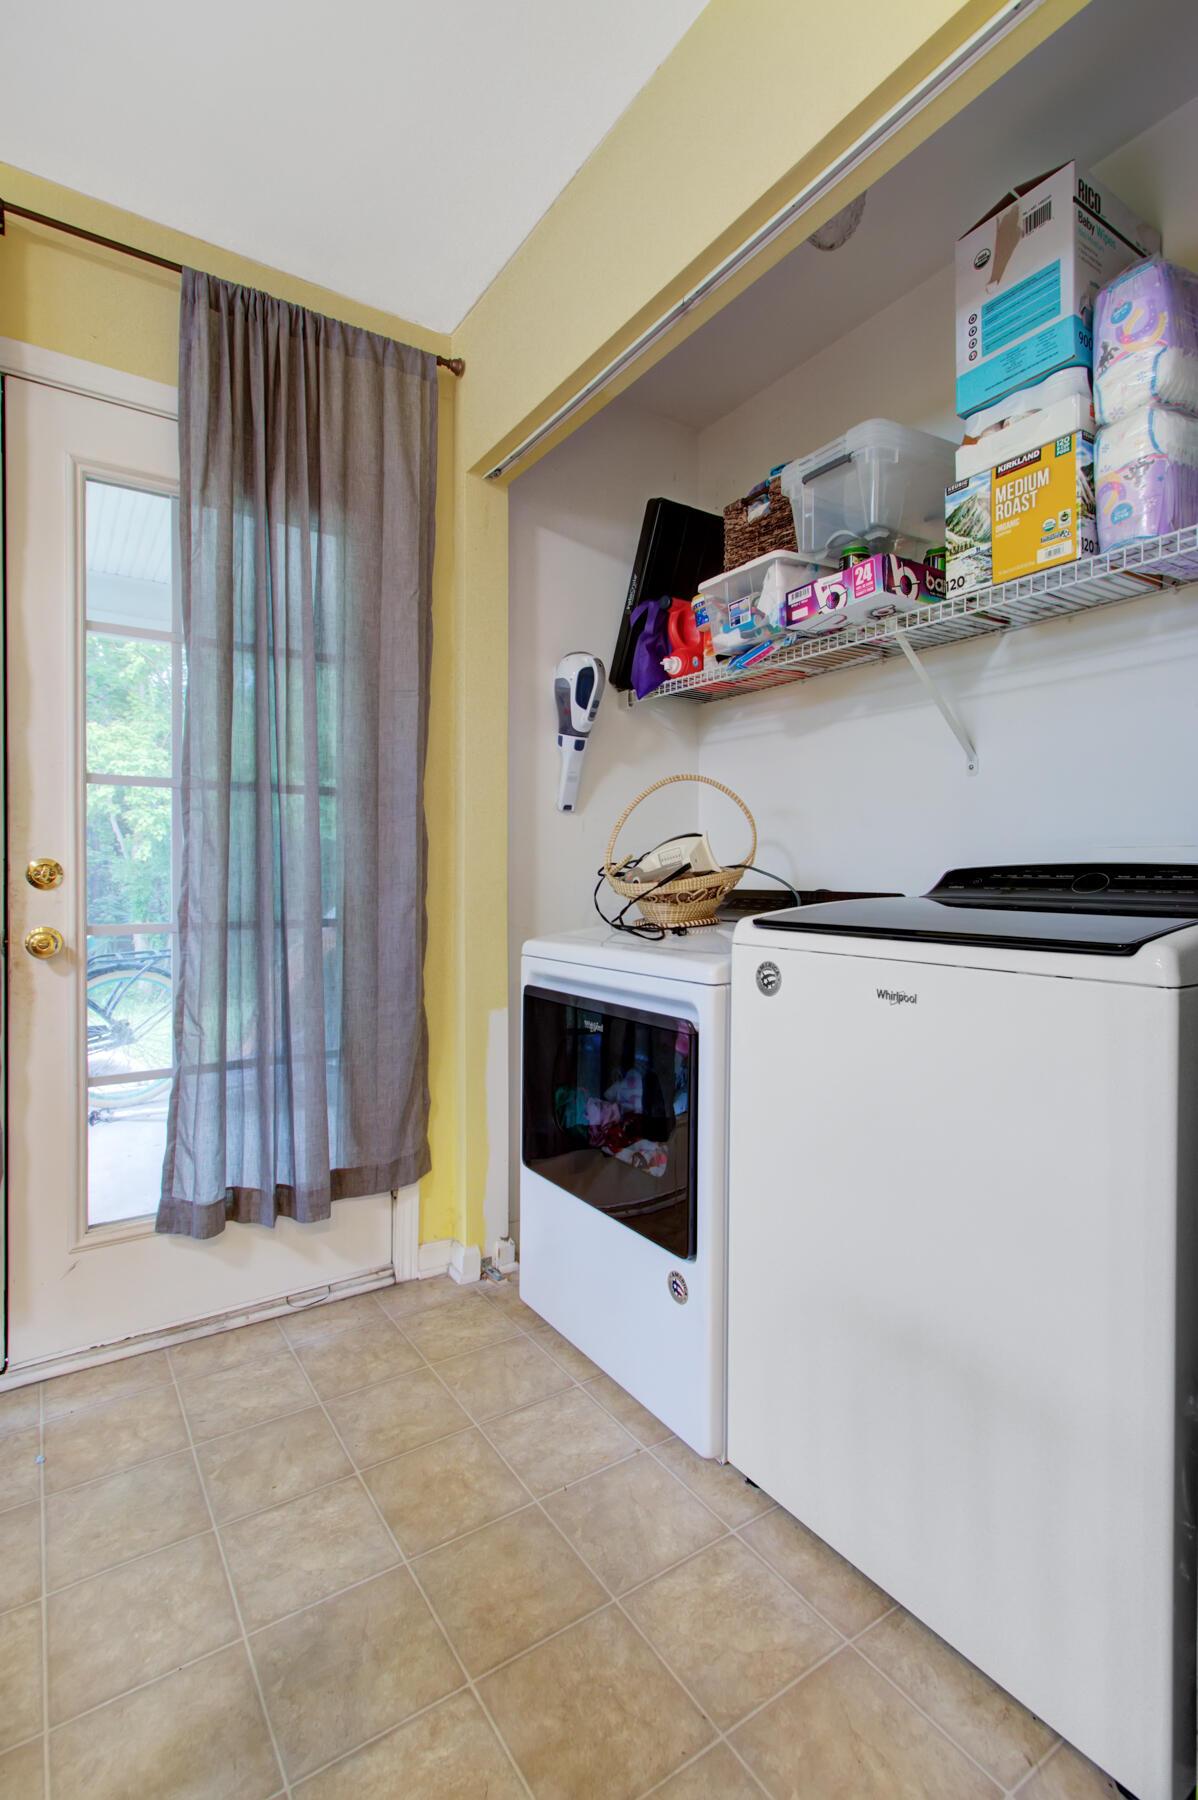 Dunes West Homes For Sale - 2232 Kings Gate, Mount Pleasant, SC - 16